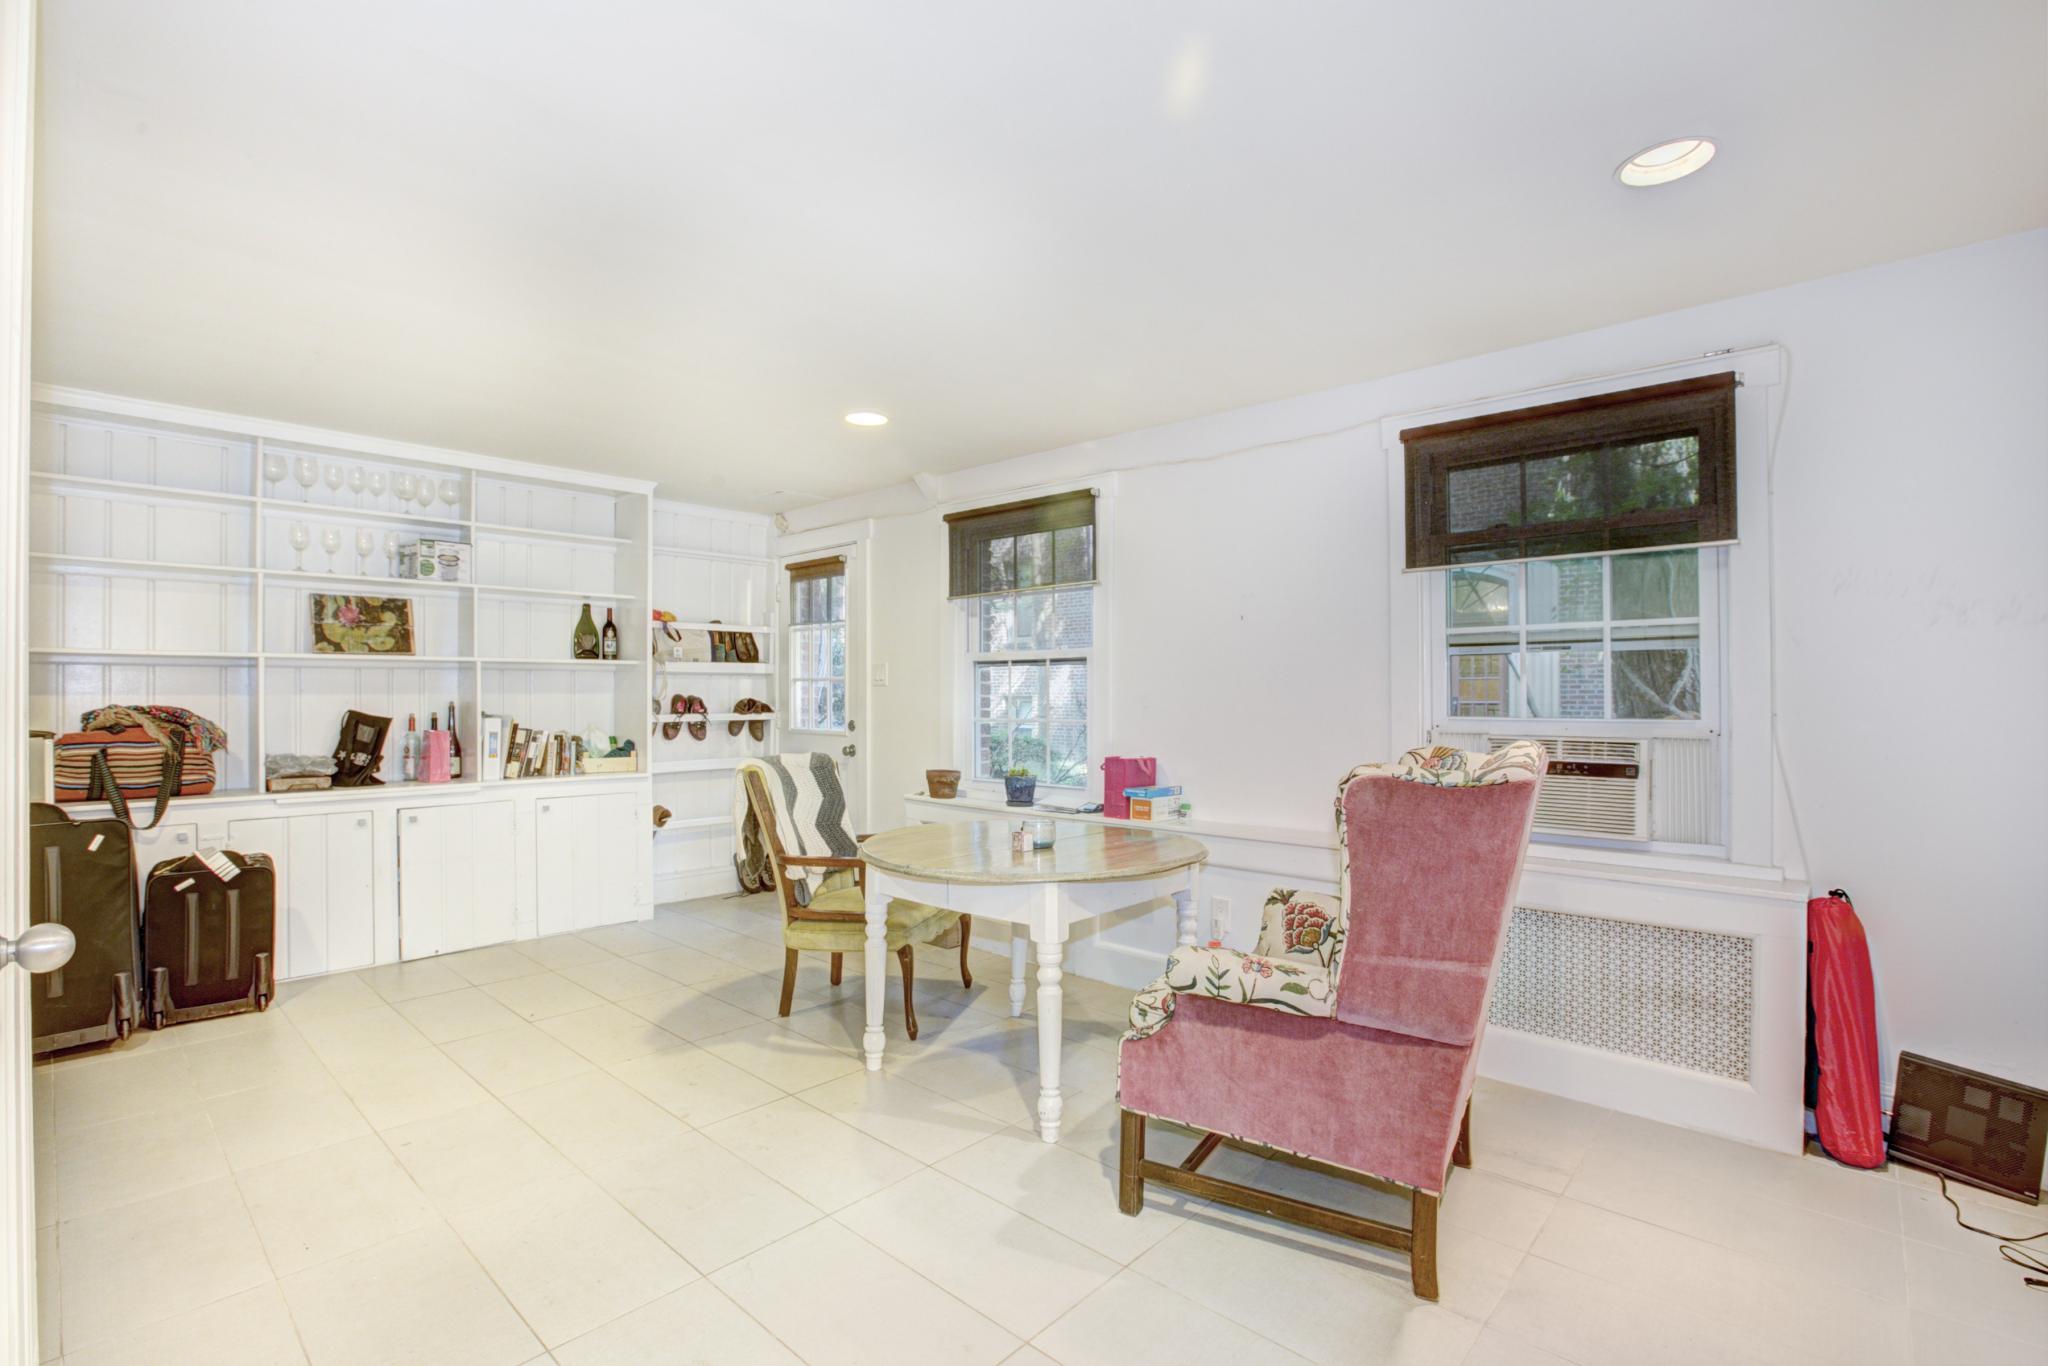 4888 Macarthur Blvd NW For Rent - Washington, DC   Trulia